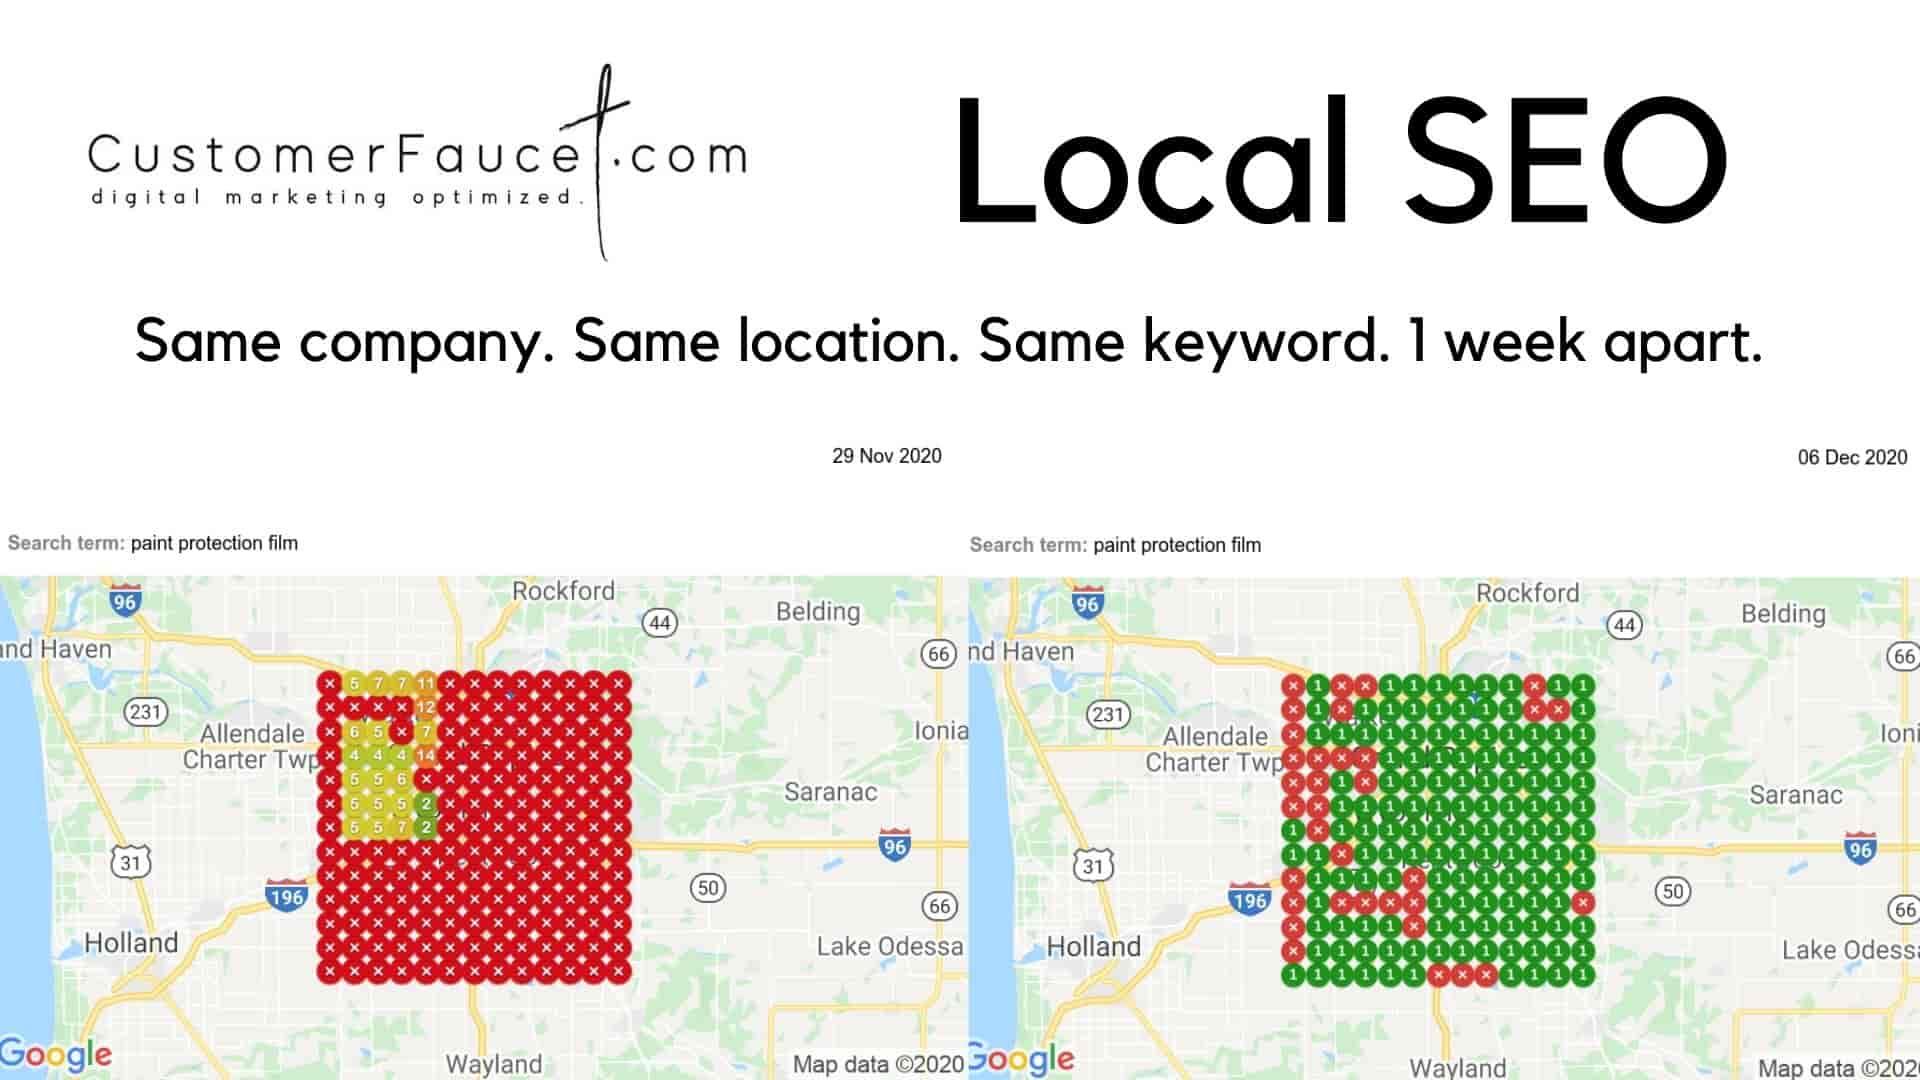 Local SEO - Google Maps search engine rankings improvement by CustomerFaucet.com